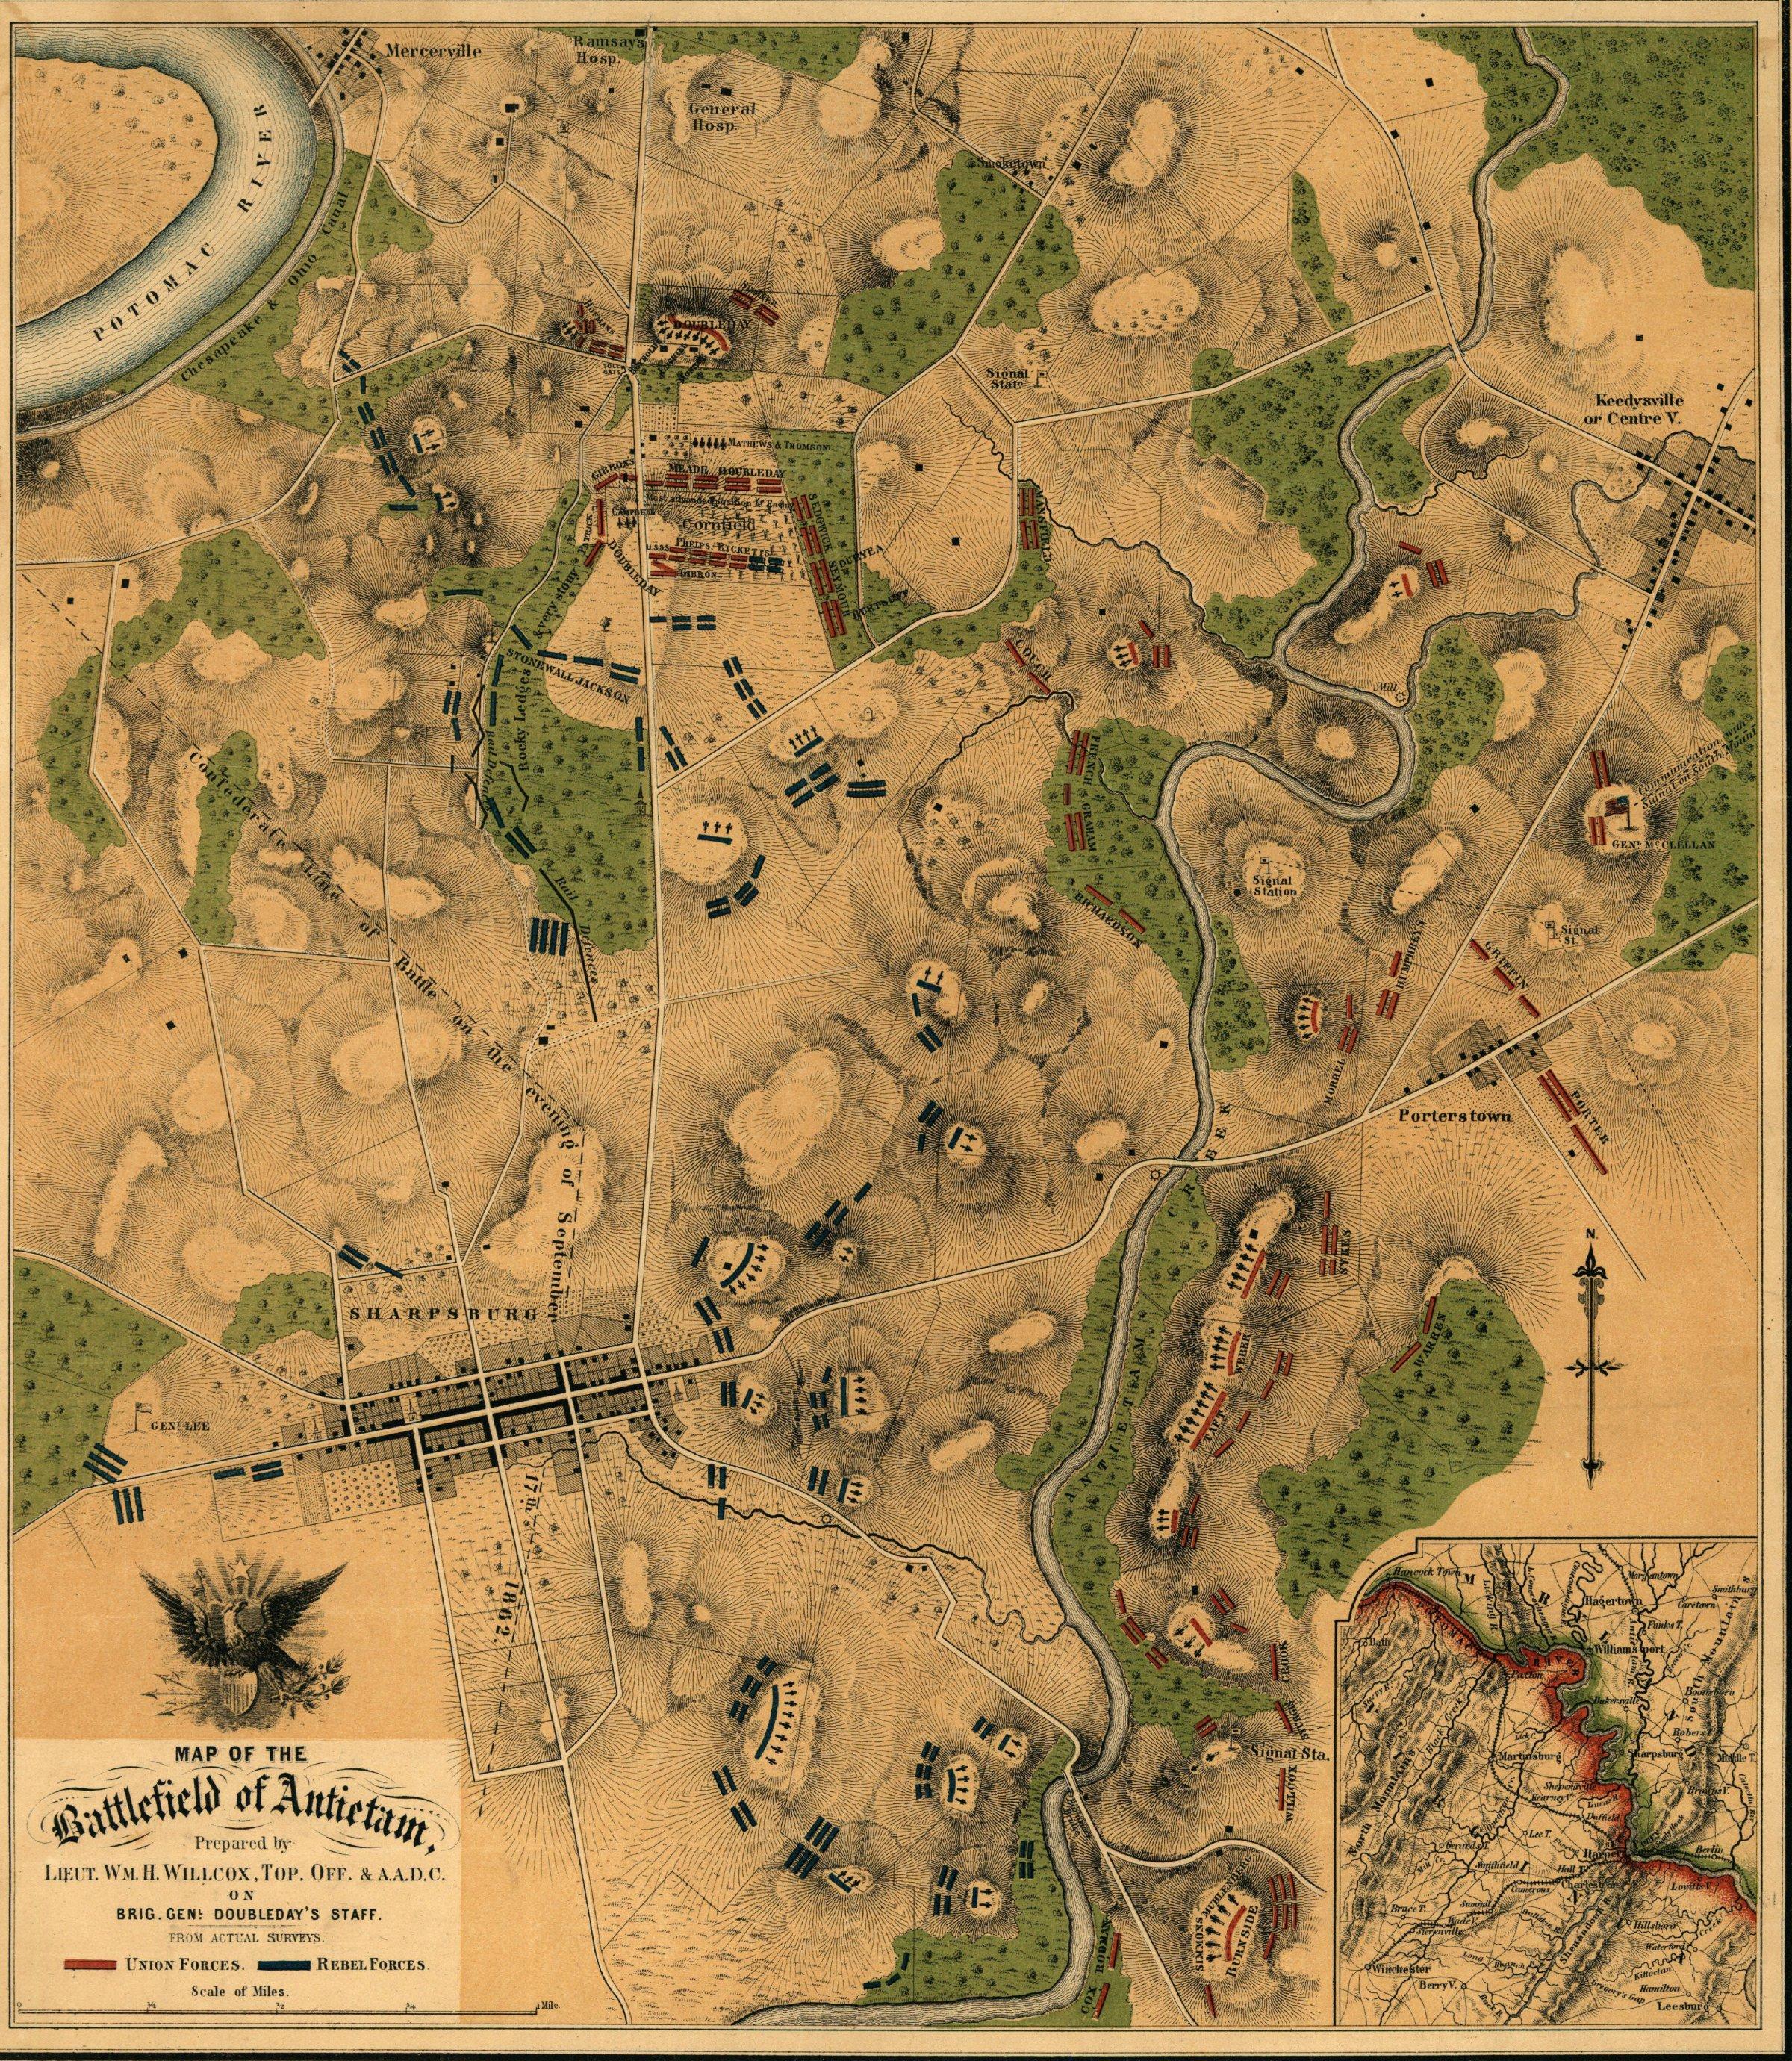 Historical Maps Of Maryland%0A Antietam Battlefield Map Sharpsburg MD mappery